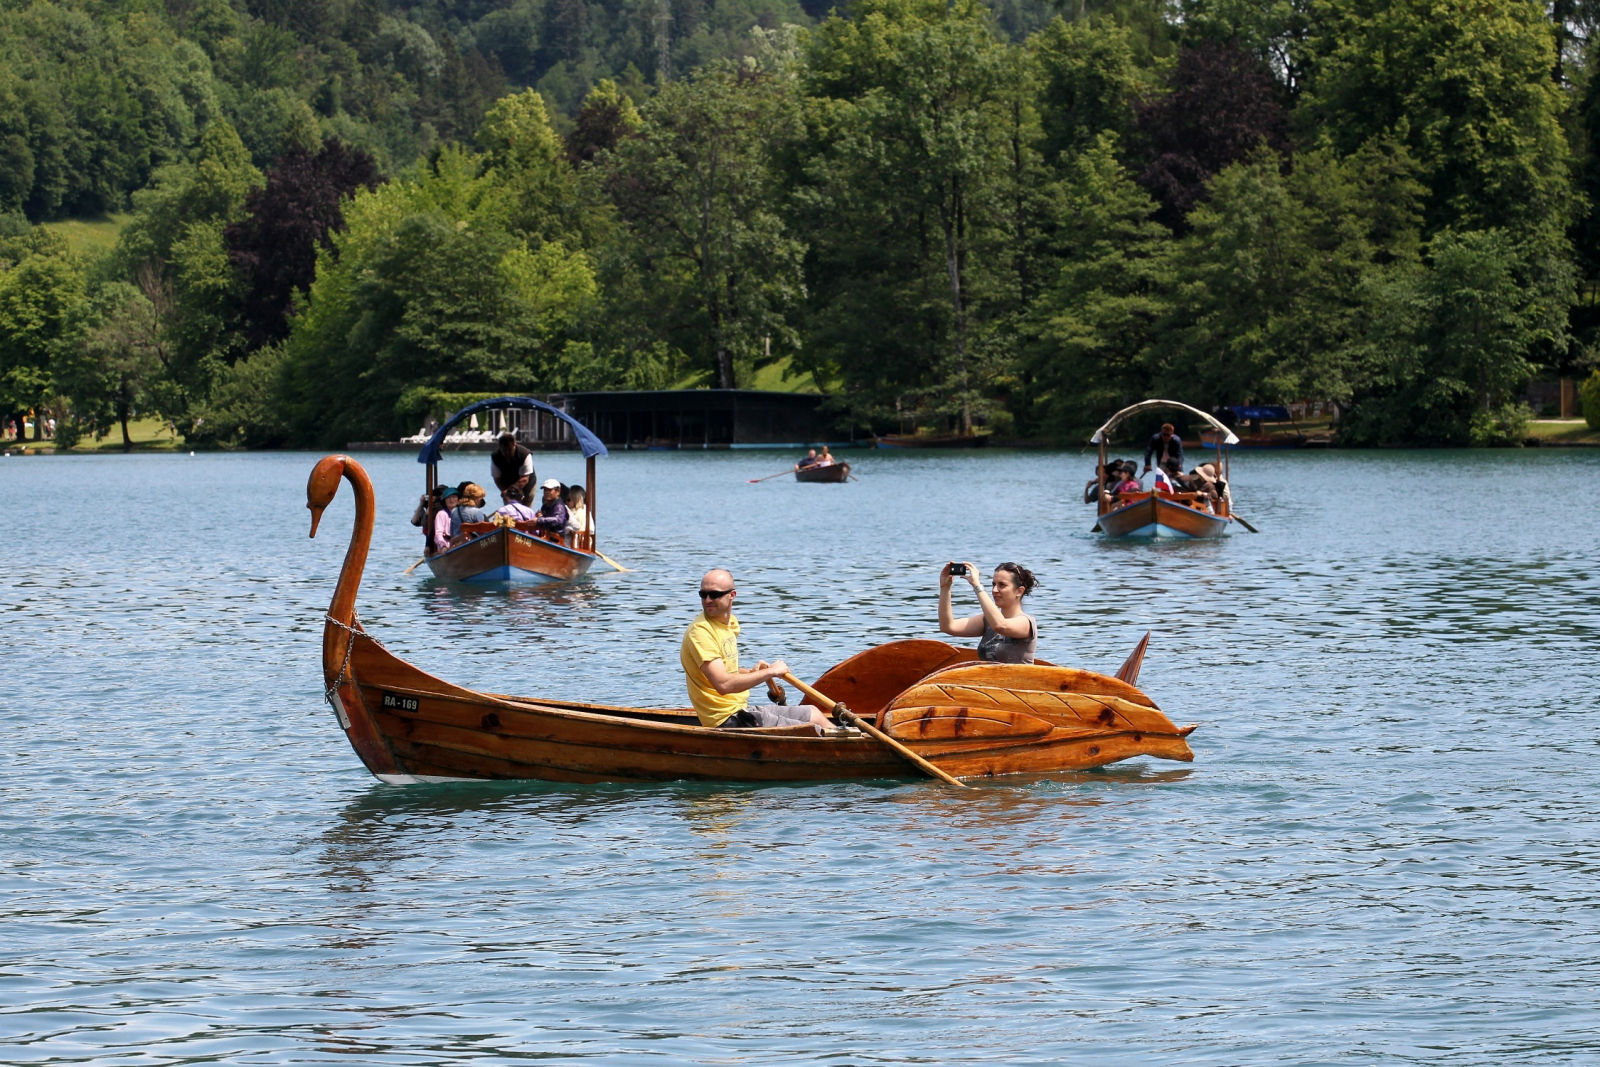 Ornate wooden boat in Lake Bled, Slovenia